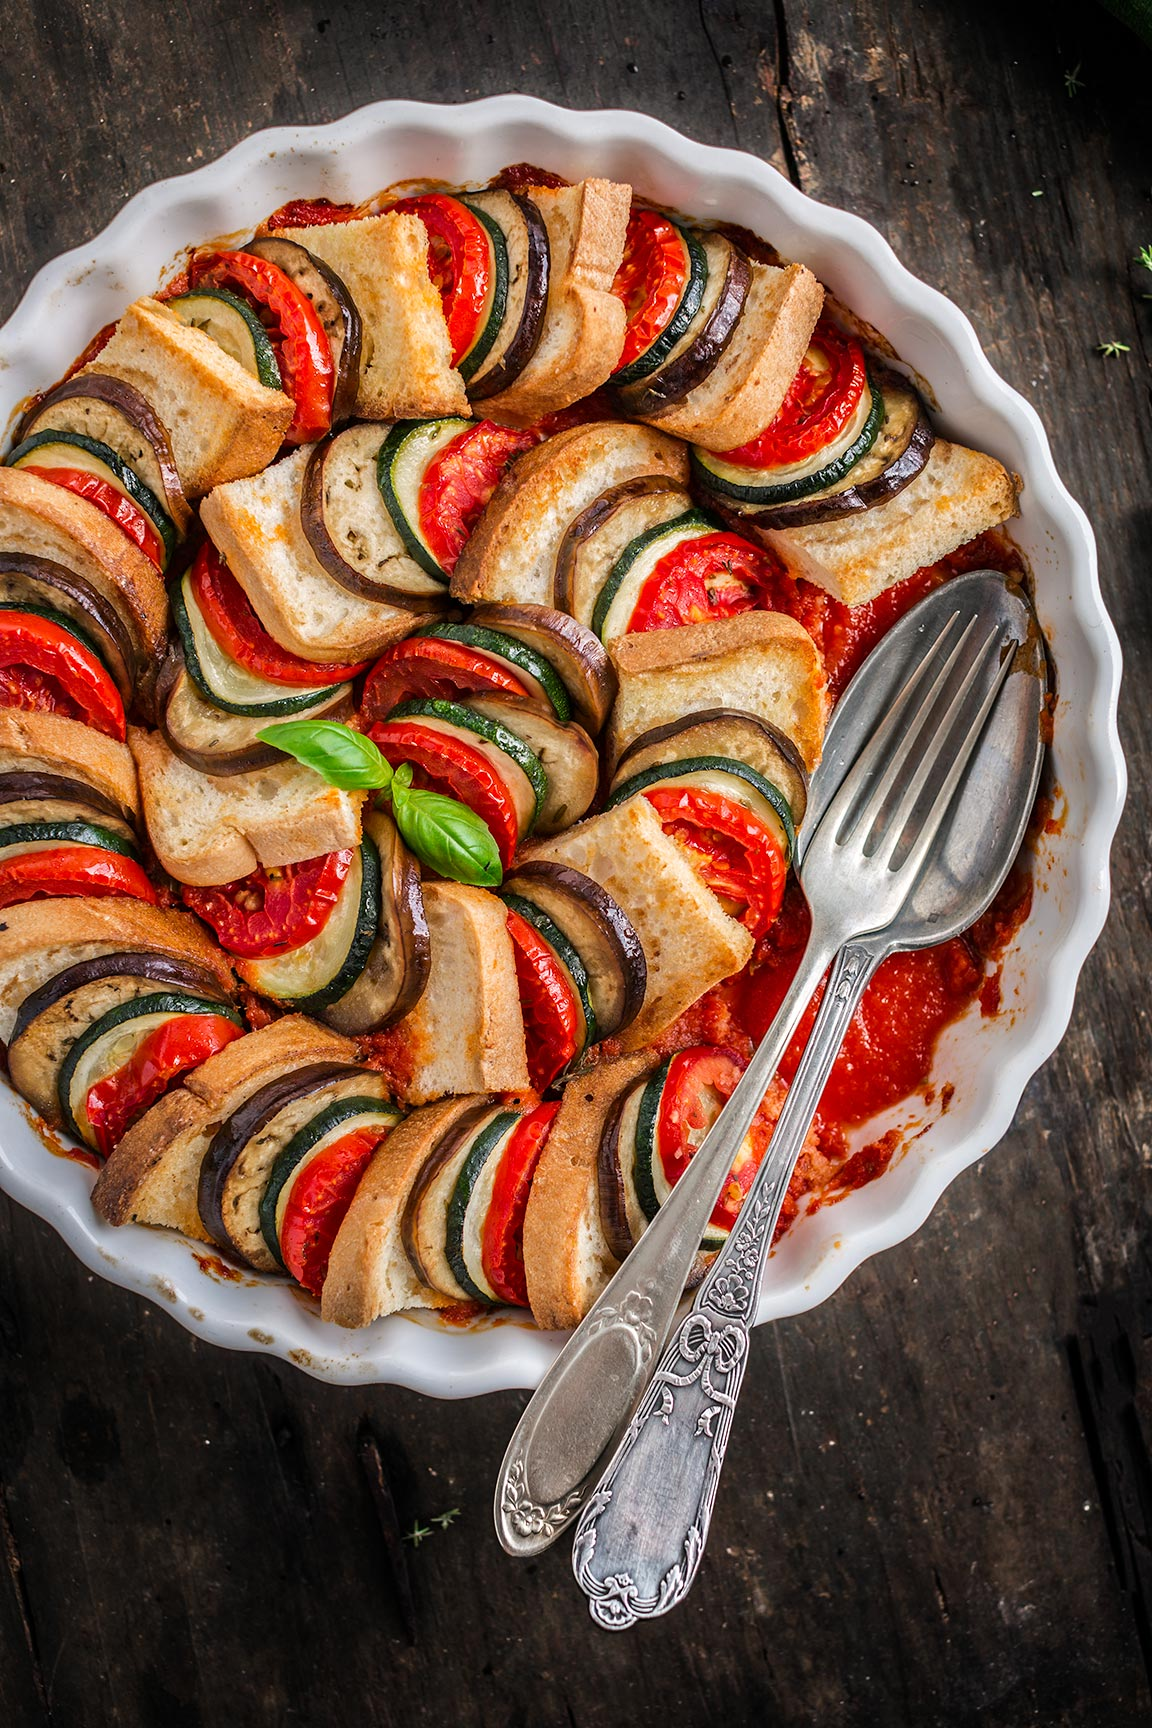 vegetable bread RATATOUILLE TIAN #vegan #glutenfree tian raratouille di pane e verdure - ricetta senza glutine vegan